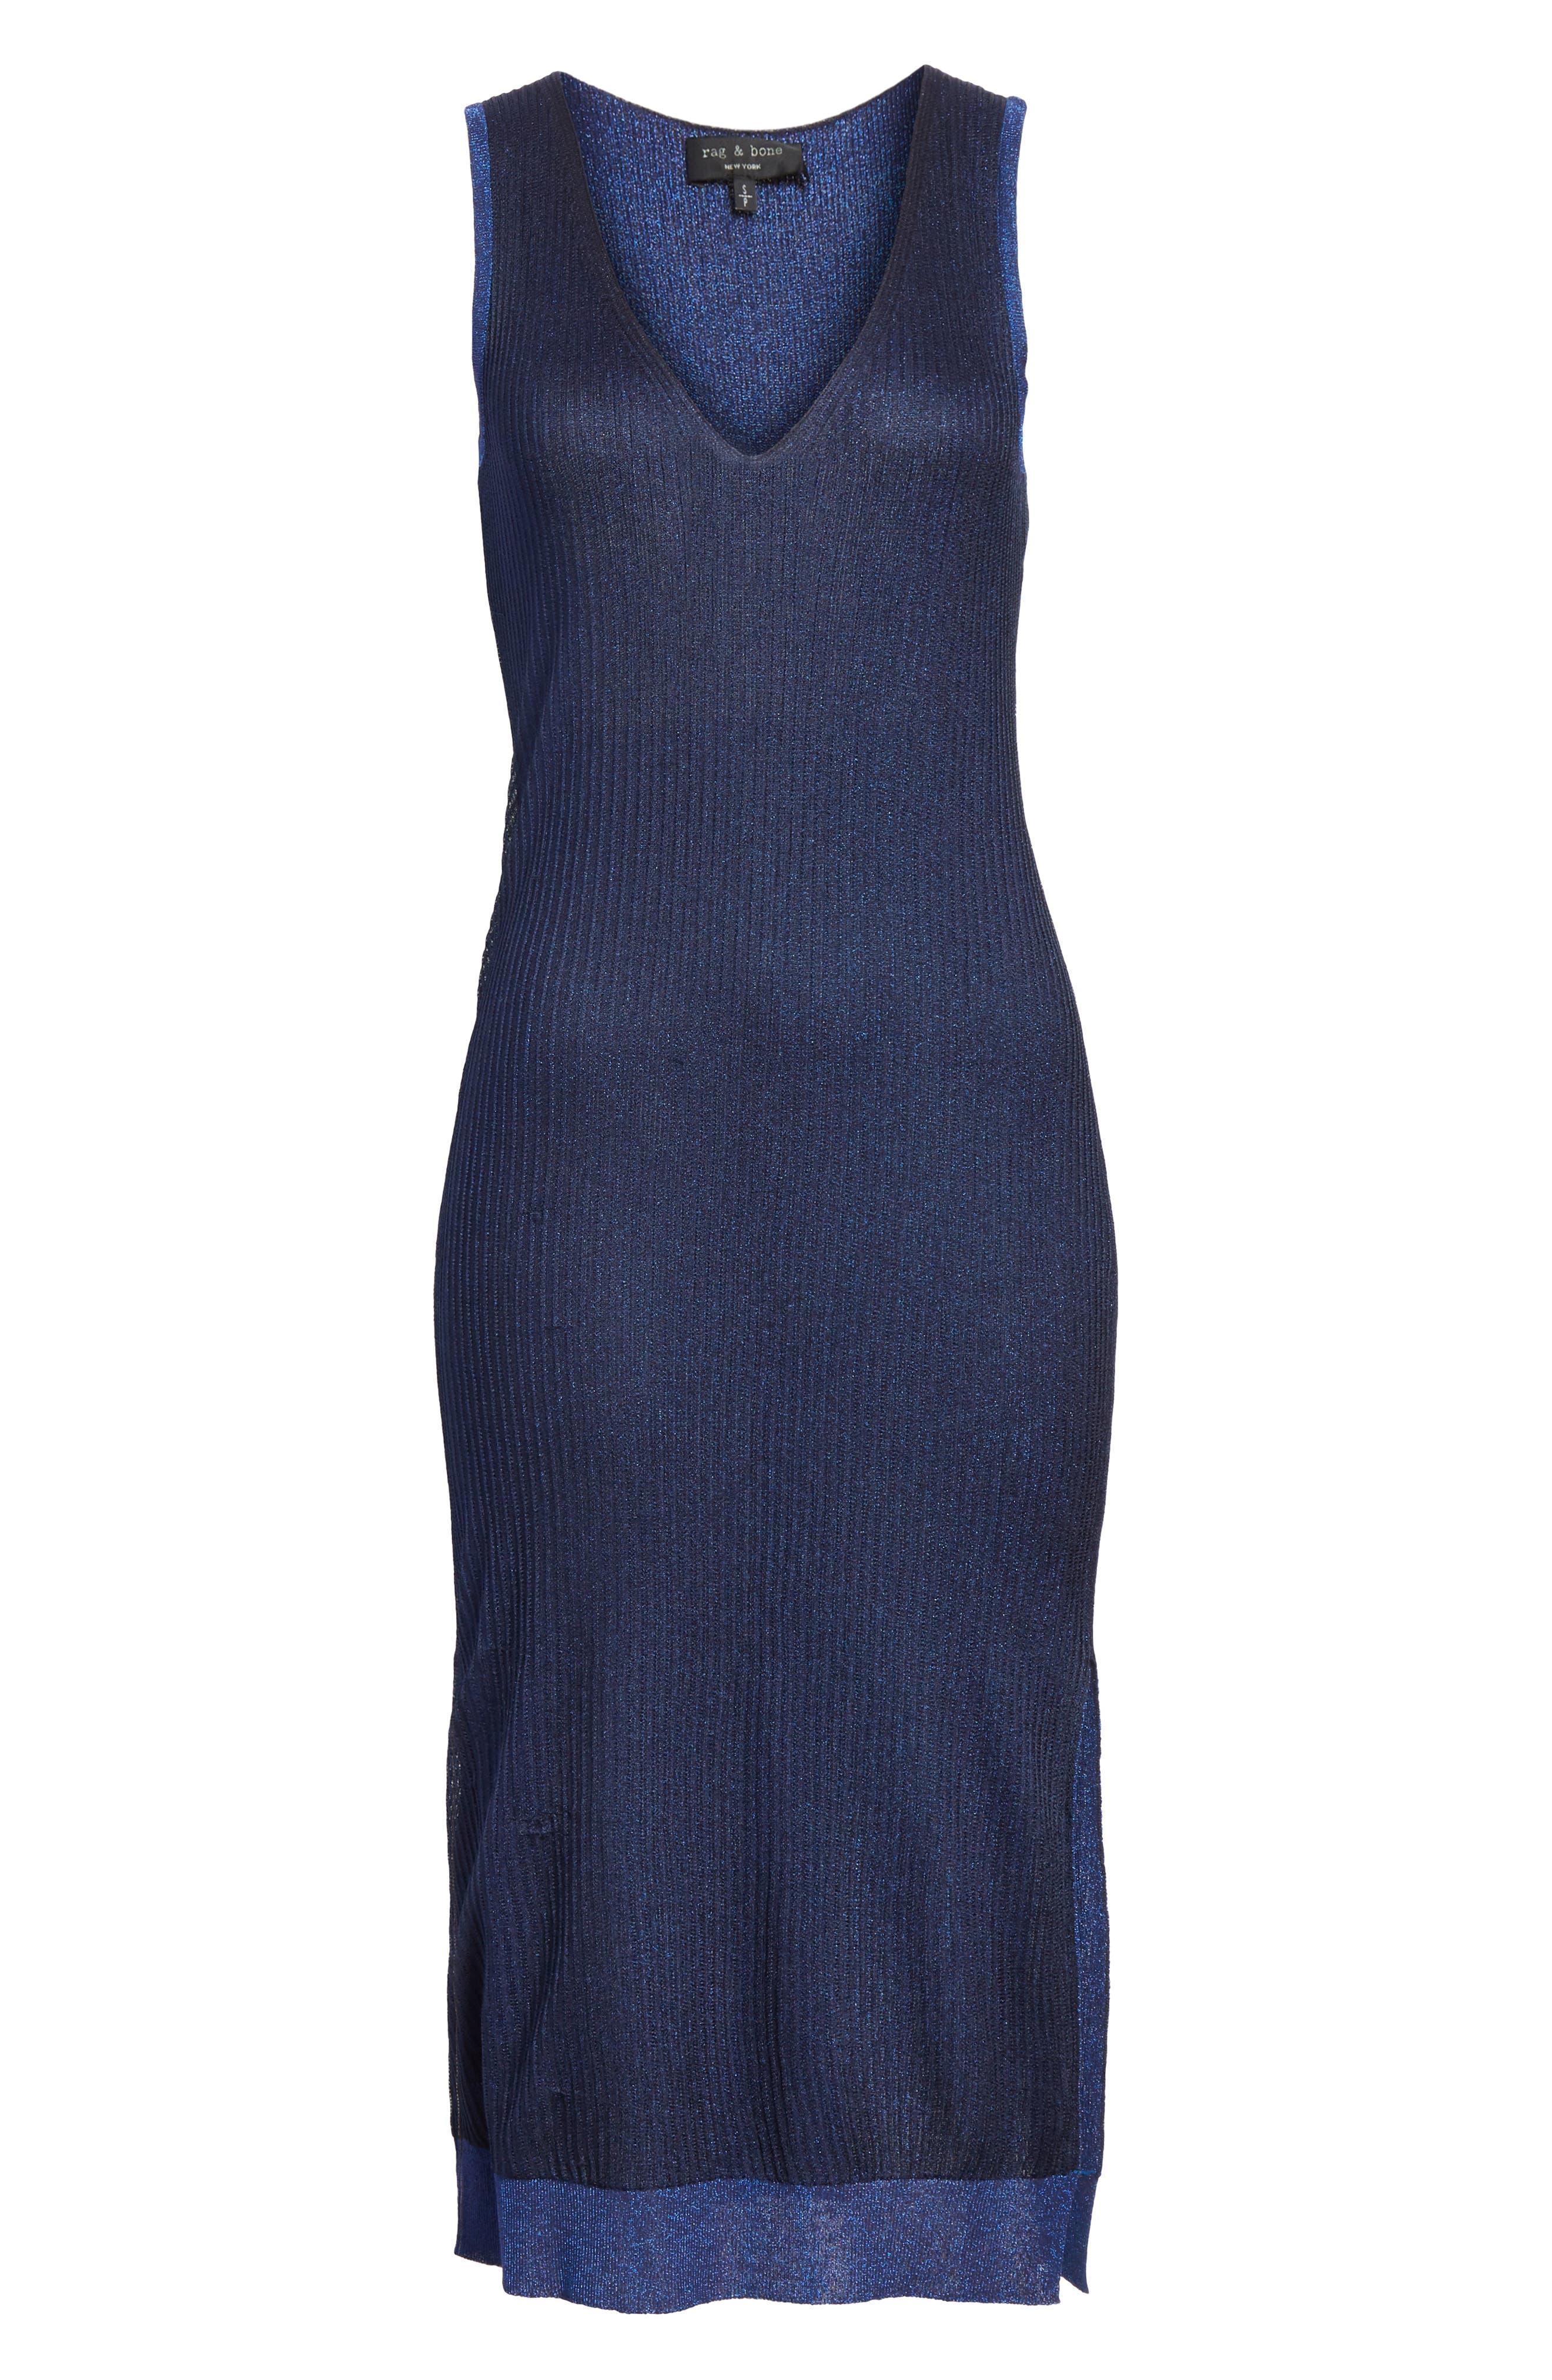 Cora Ribbed Dress,                             Alternate thumbnail 6, color,                             NAVY/ BLUE